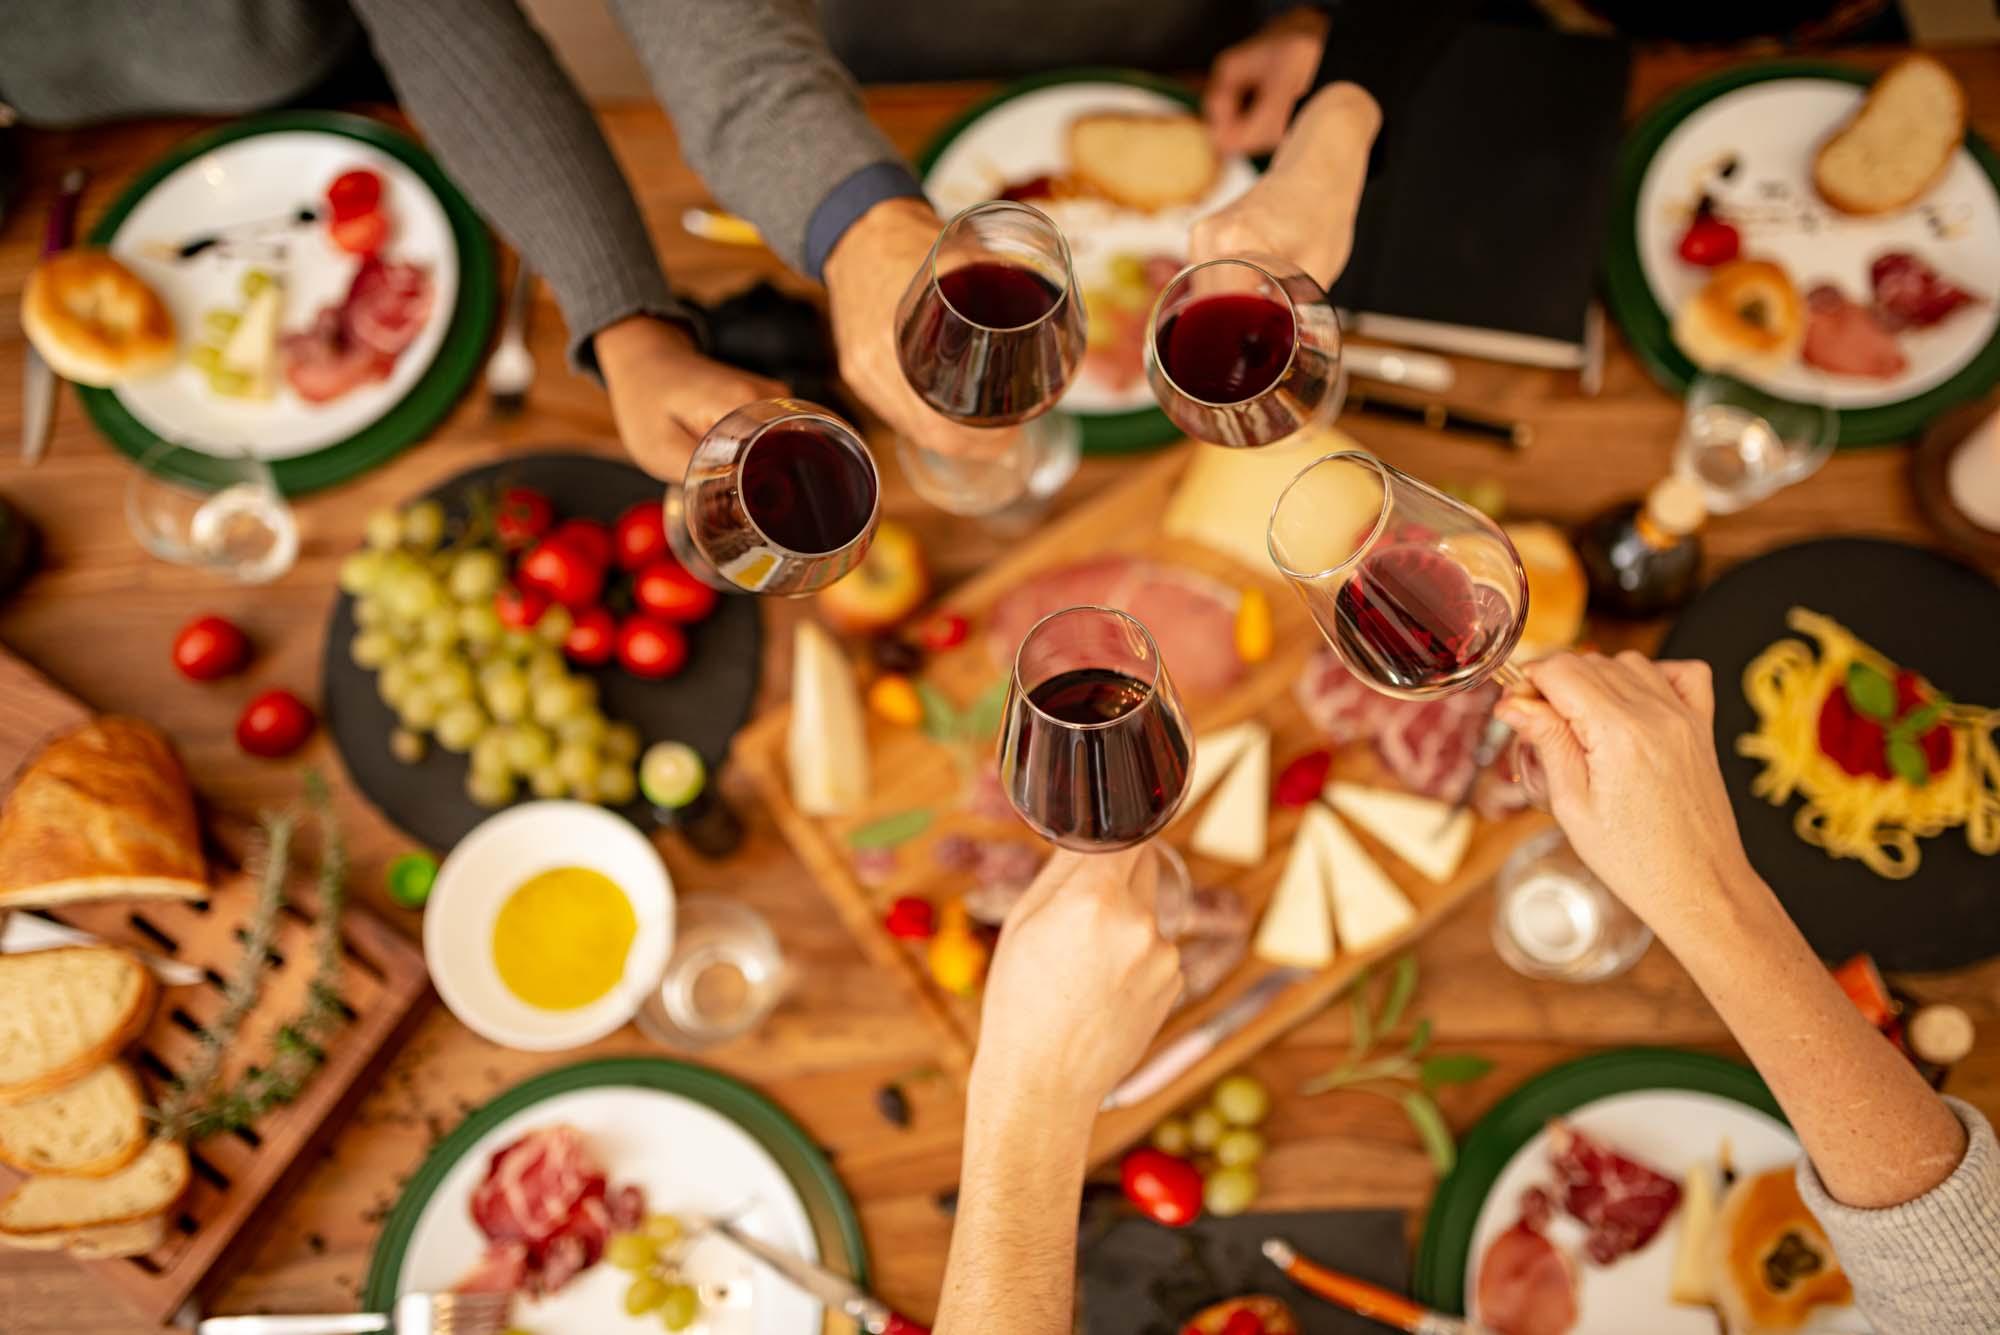 Corsi Di Cucina Cene Aziendali a Brescia